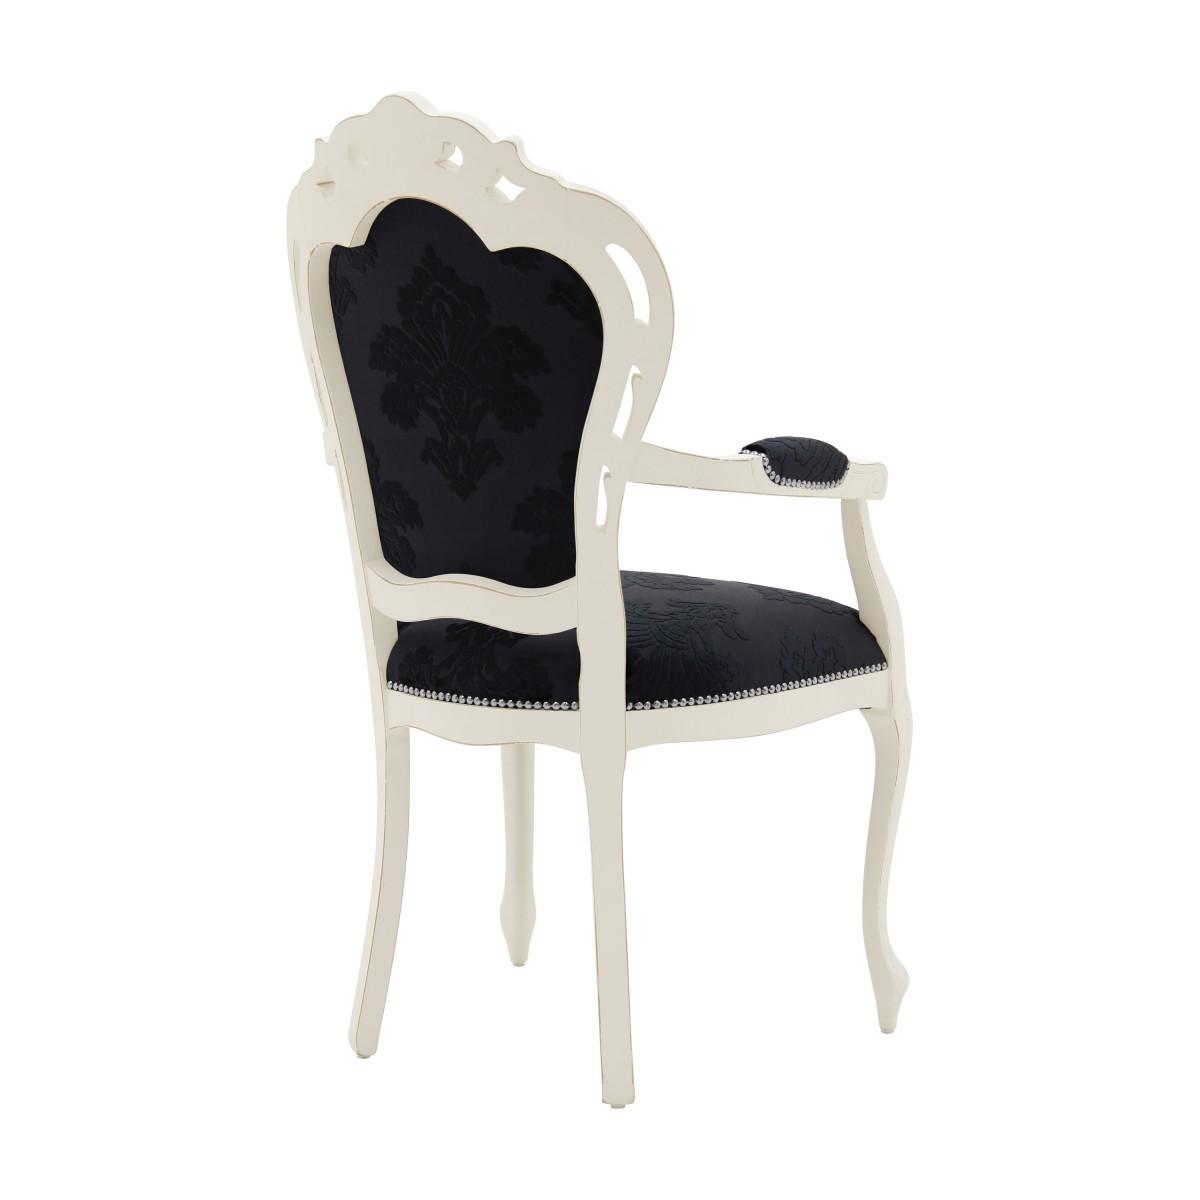 replica armchair traforata 1 4497